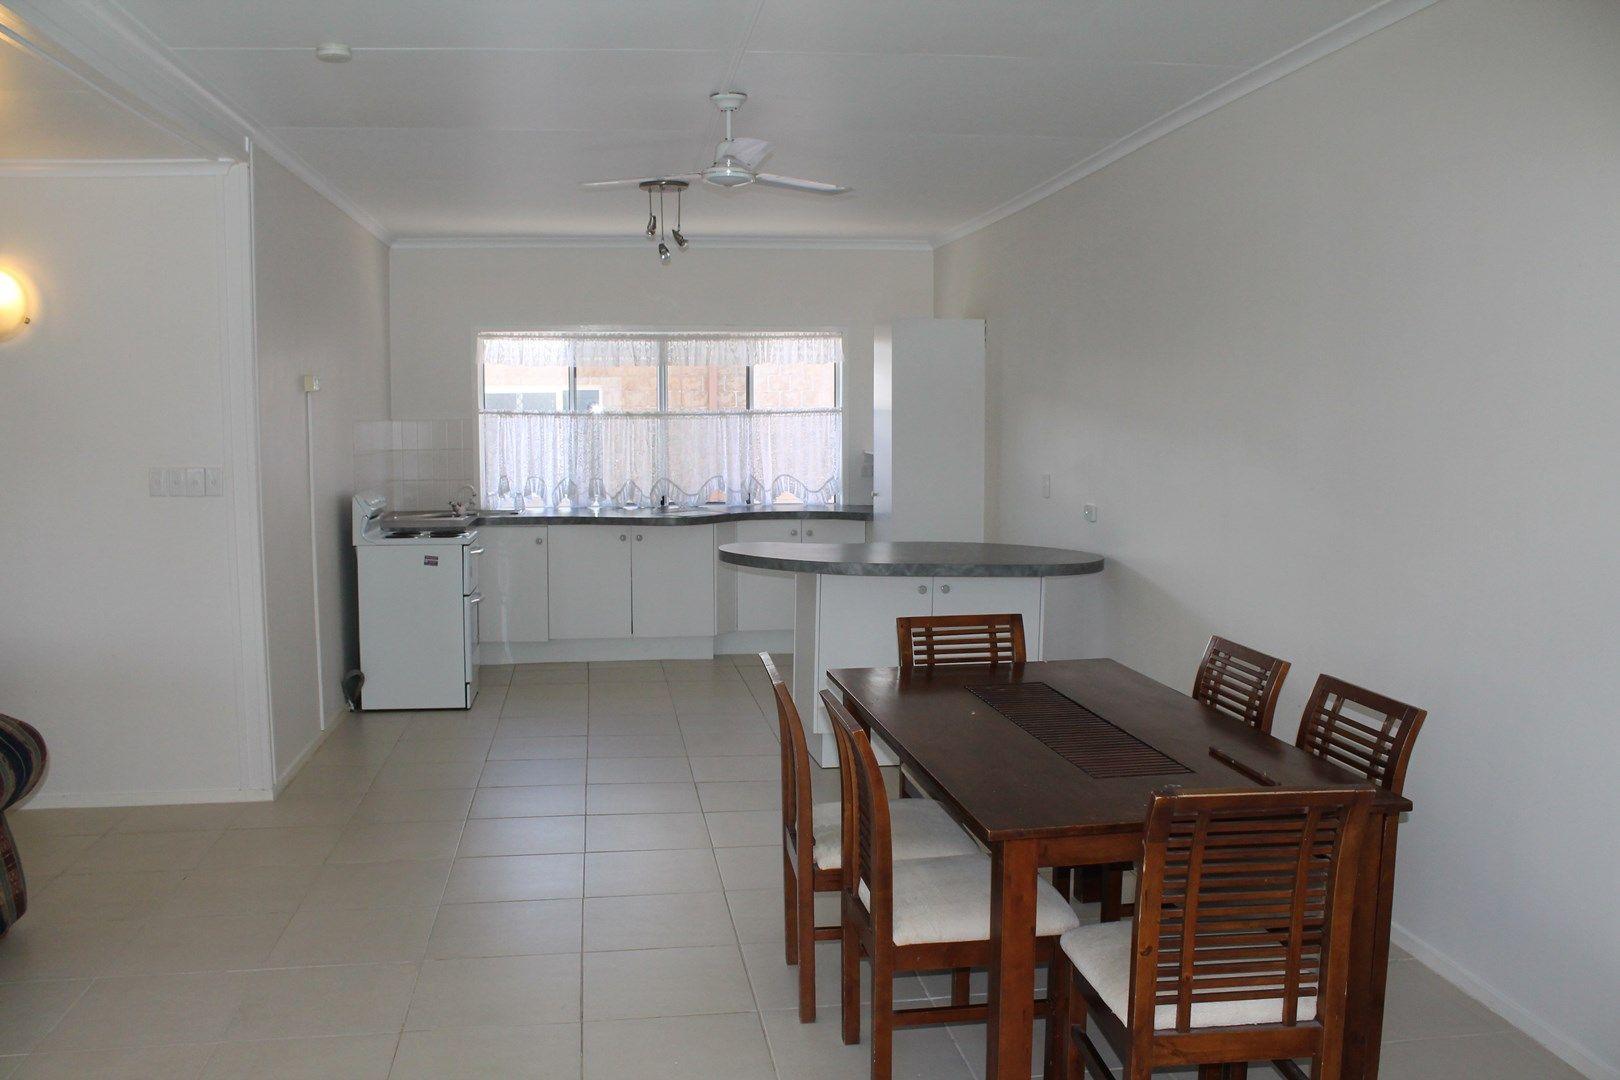 2/638 Scenic Highway, Mulambin QLD 4703, Image 0